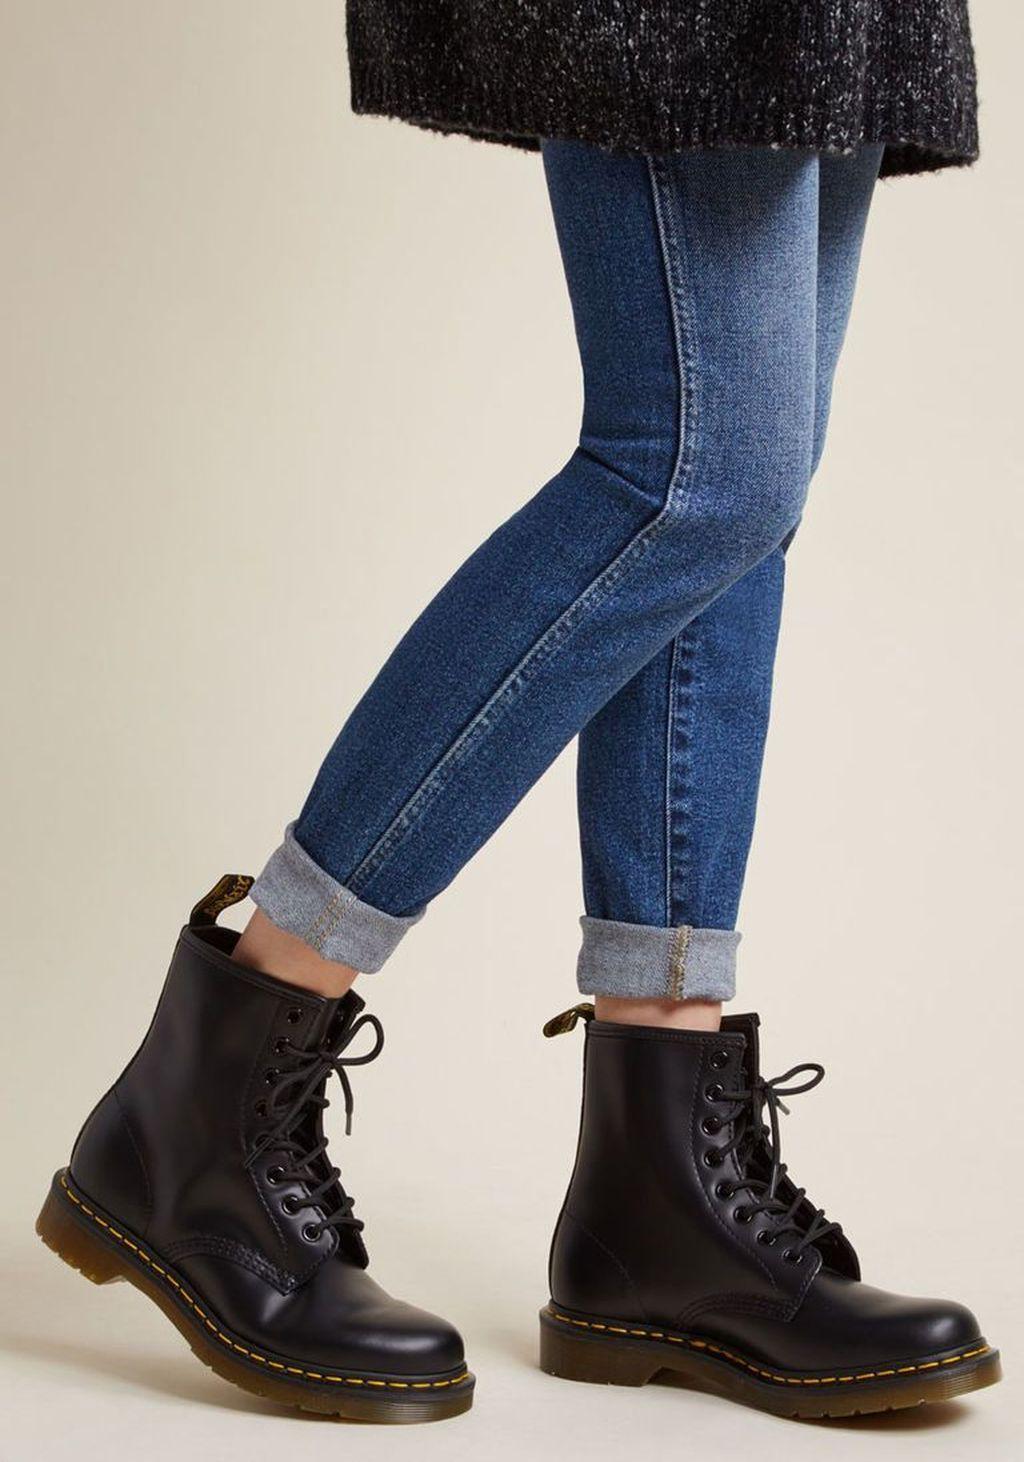 doc martin winter boots